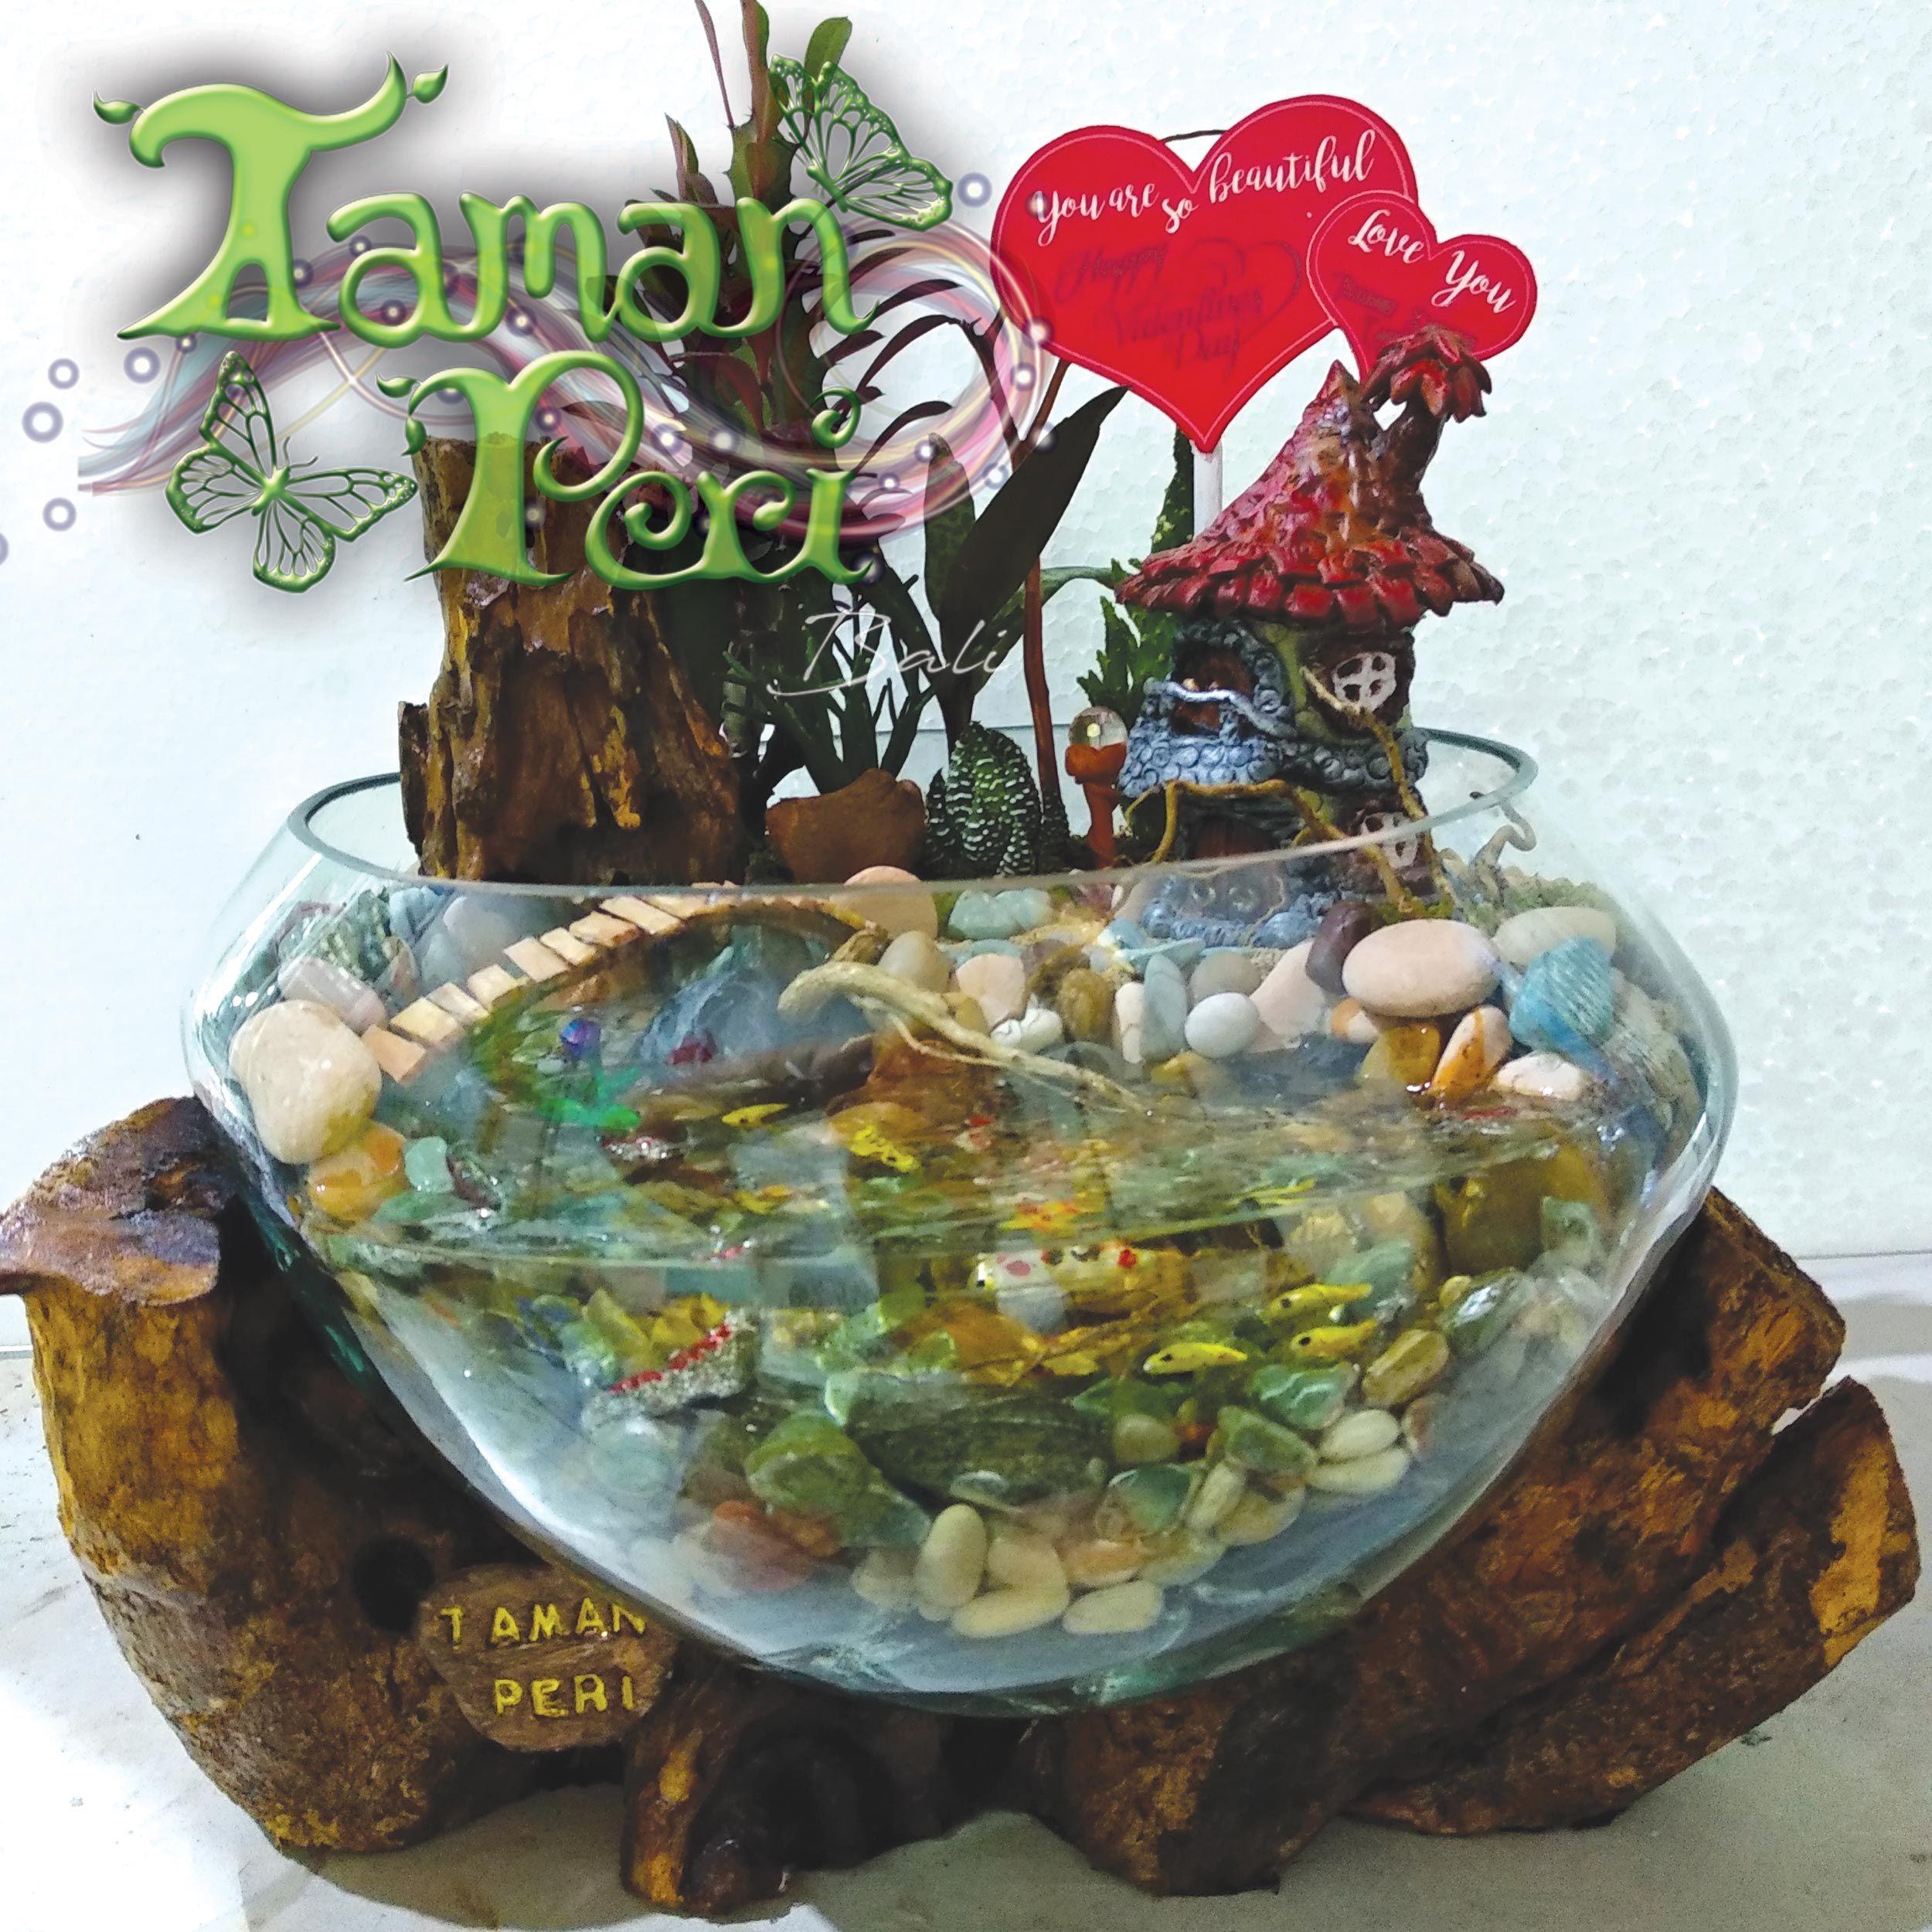 Bali Kaktus Succulent Mini Fairy Garden Valentine Gift